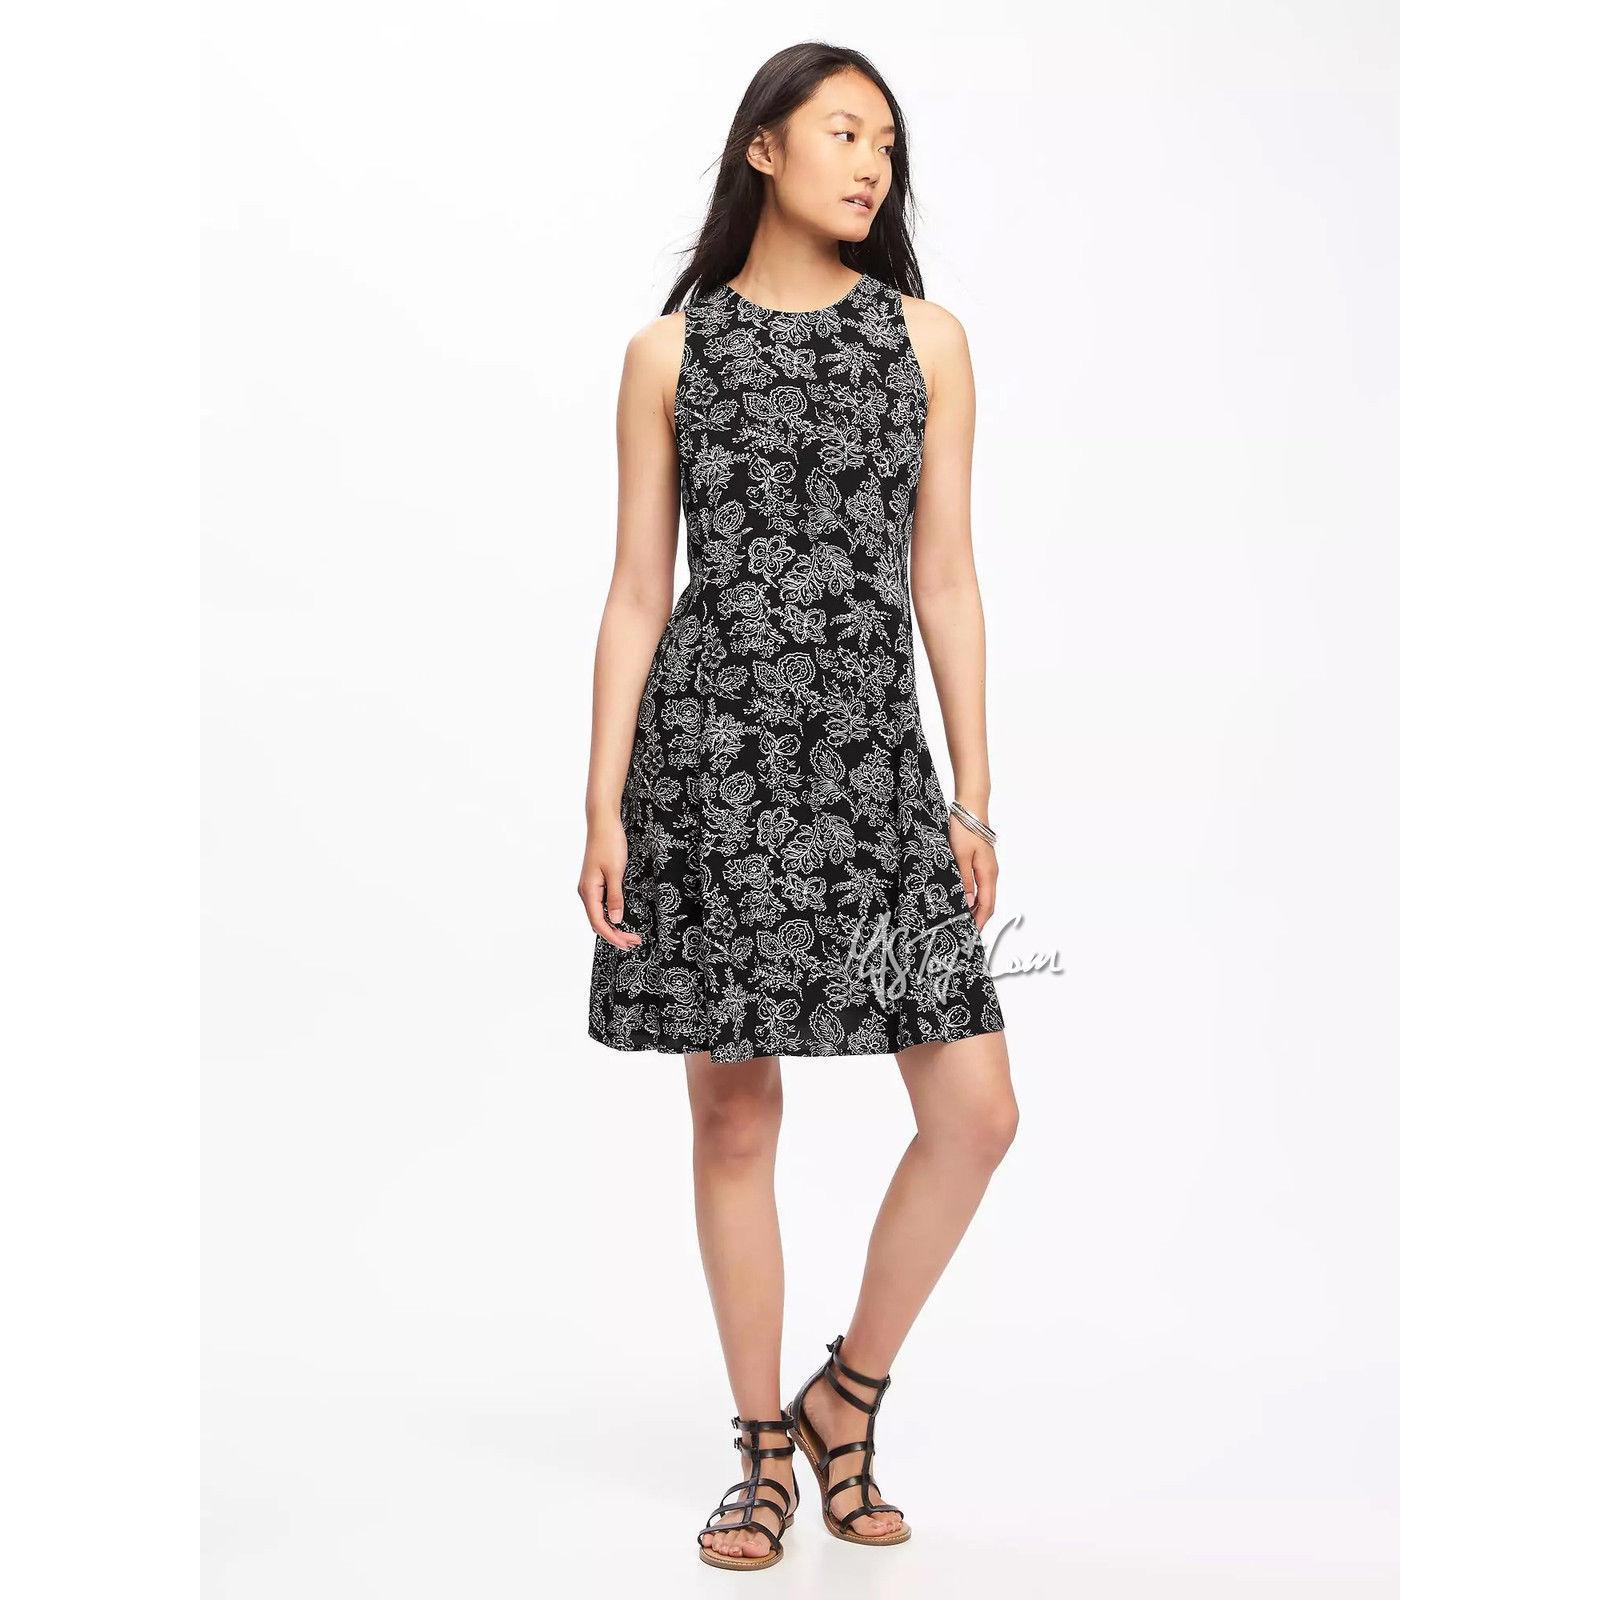 NWT OLD NAVY Cute Soft Stylist Women's Sleeveless Summer Swing Petite Dress S/P - $29.99